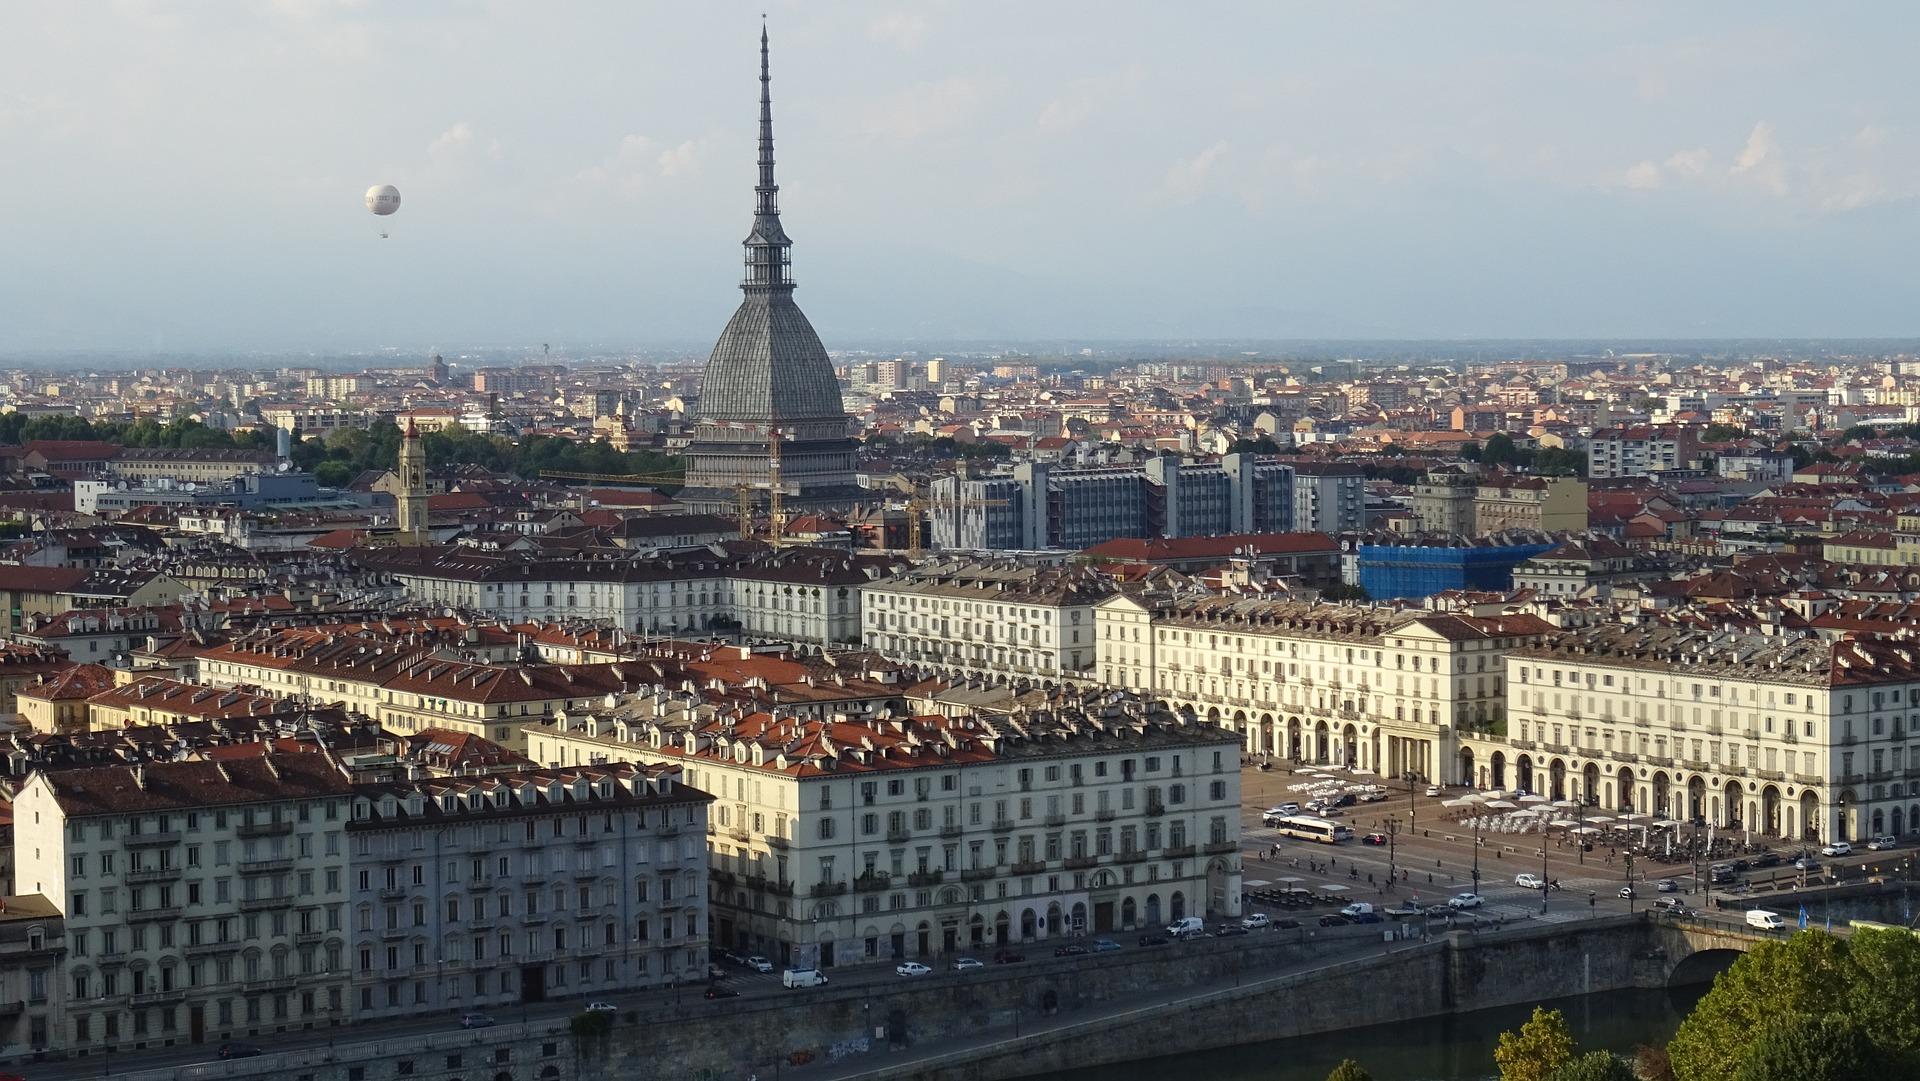 Skyline de Turin